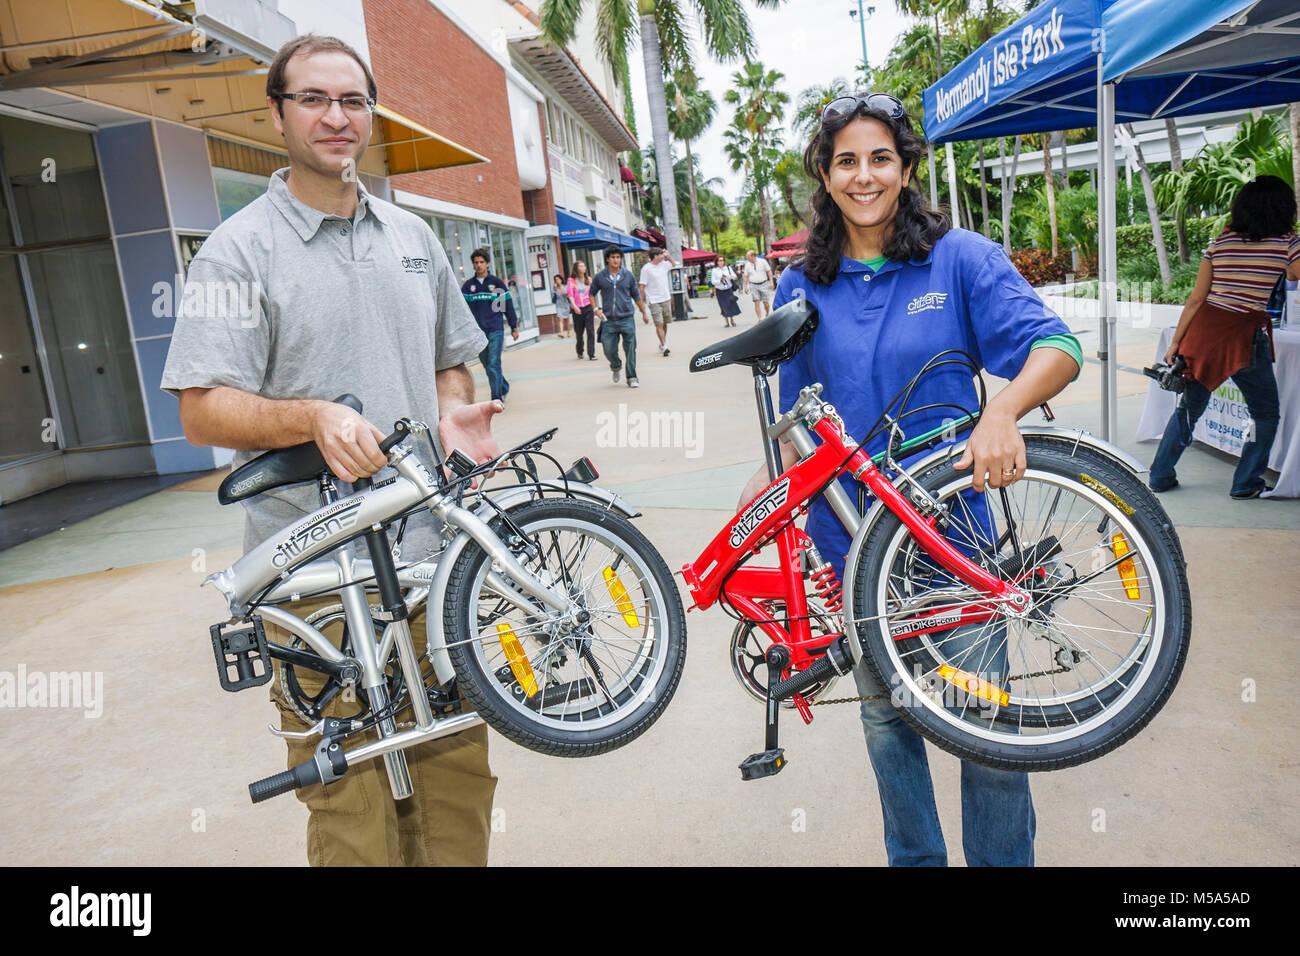 Rad zur Arbeit Woche Bürger Fahrrad Falten zeigen Ausstellung Mann Frau leichte grüne Bewegung Fahrrad Stockbild